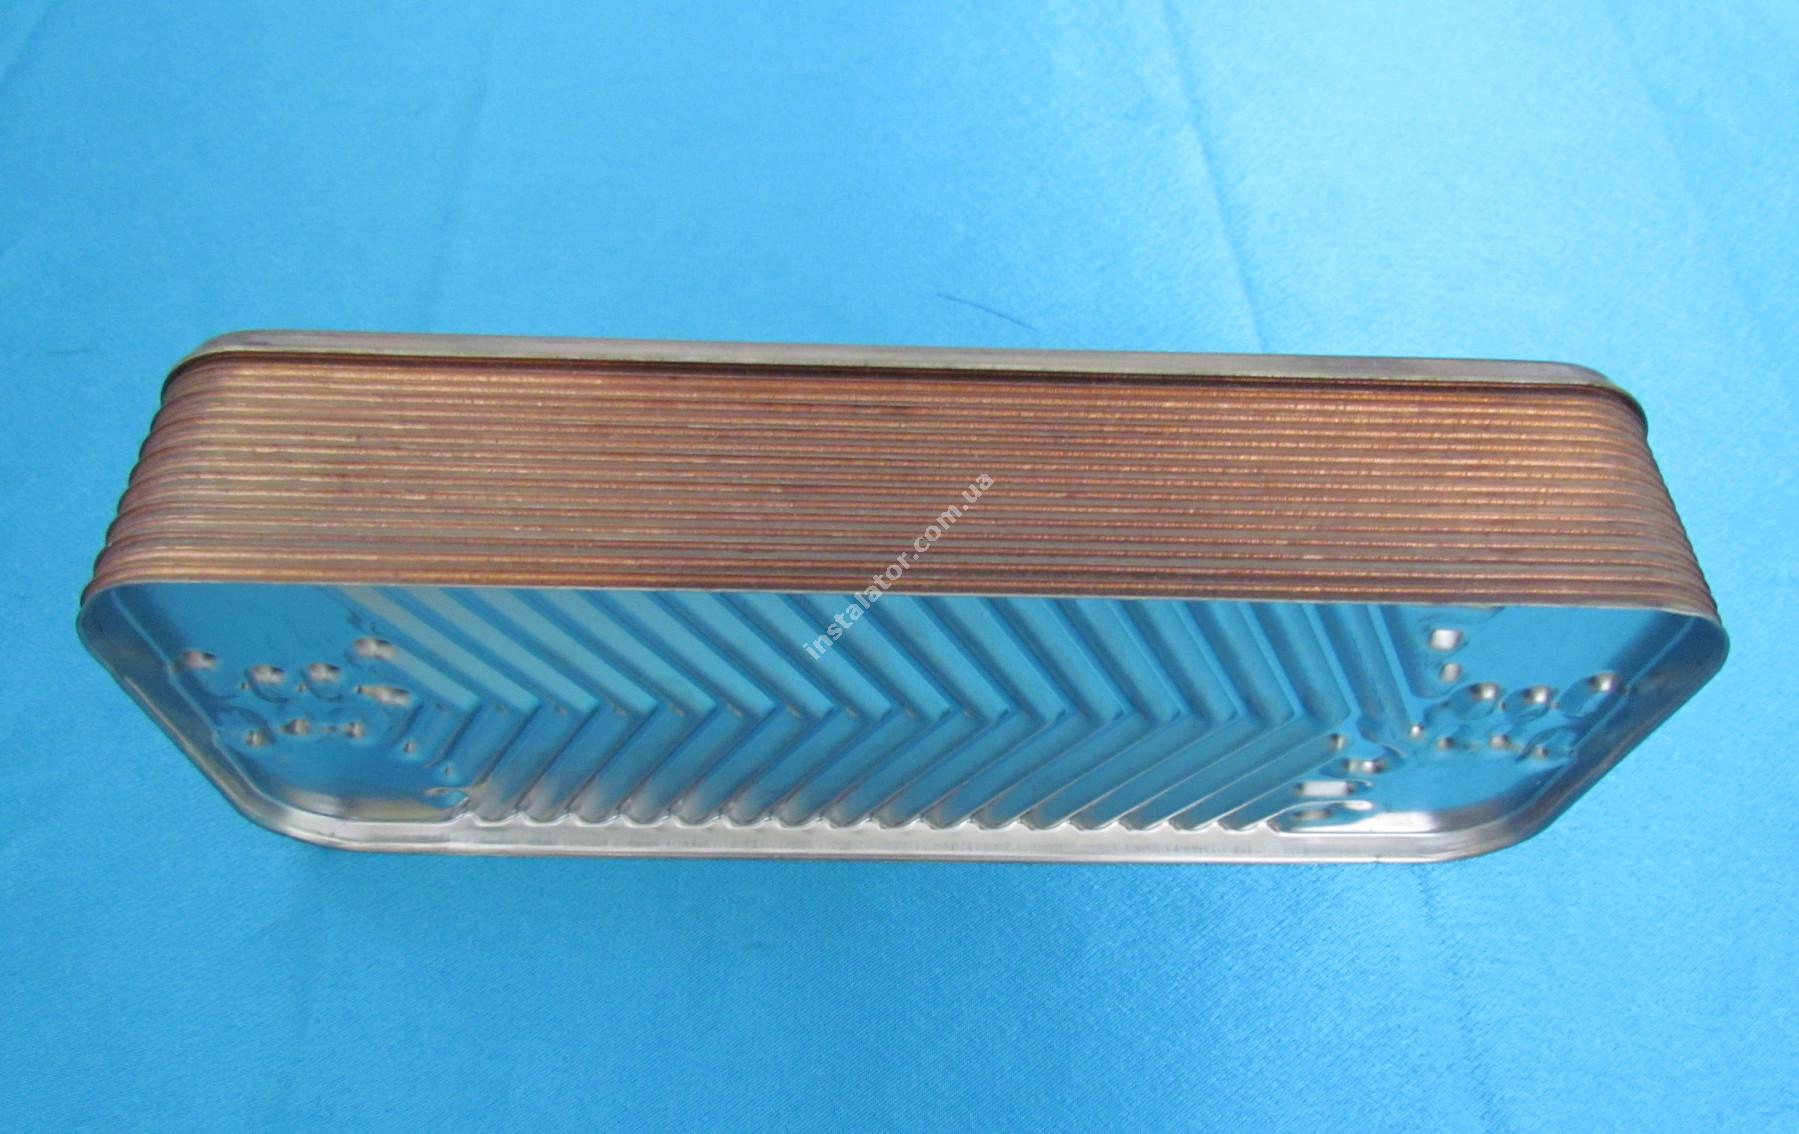 17B2071613 Теплообмінник вторинний ГВП 16 пластин SAUNIER DUVAL, ZILMET full-image-2